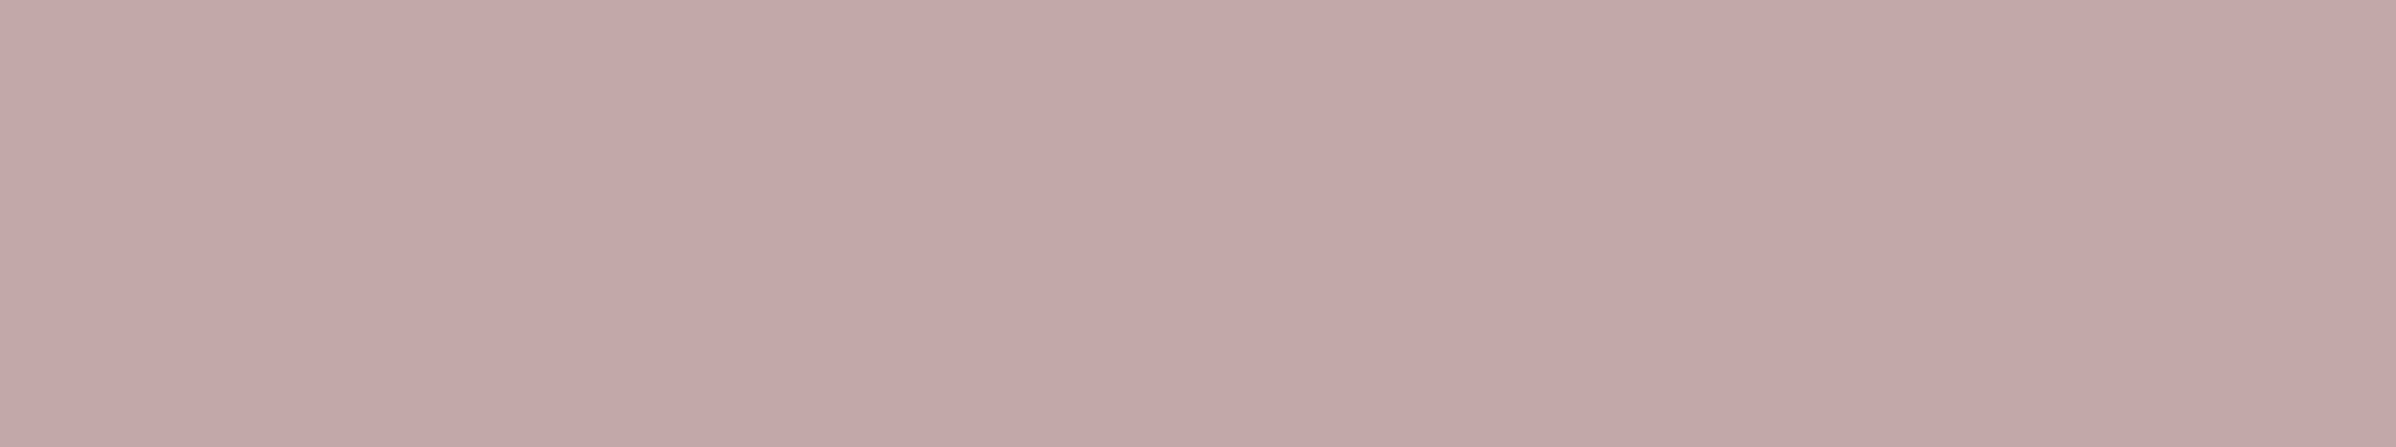 #469 @ 1% - White